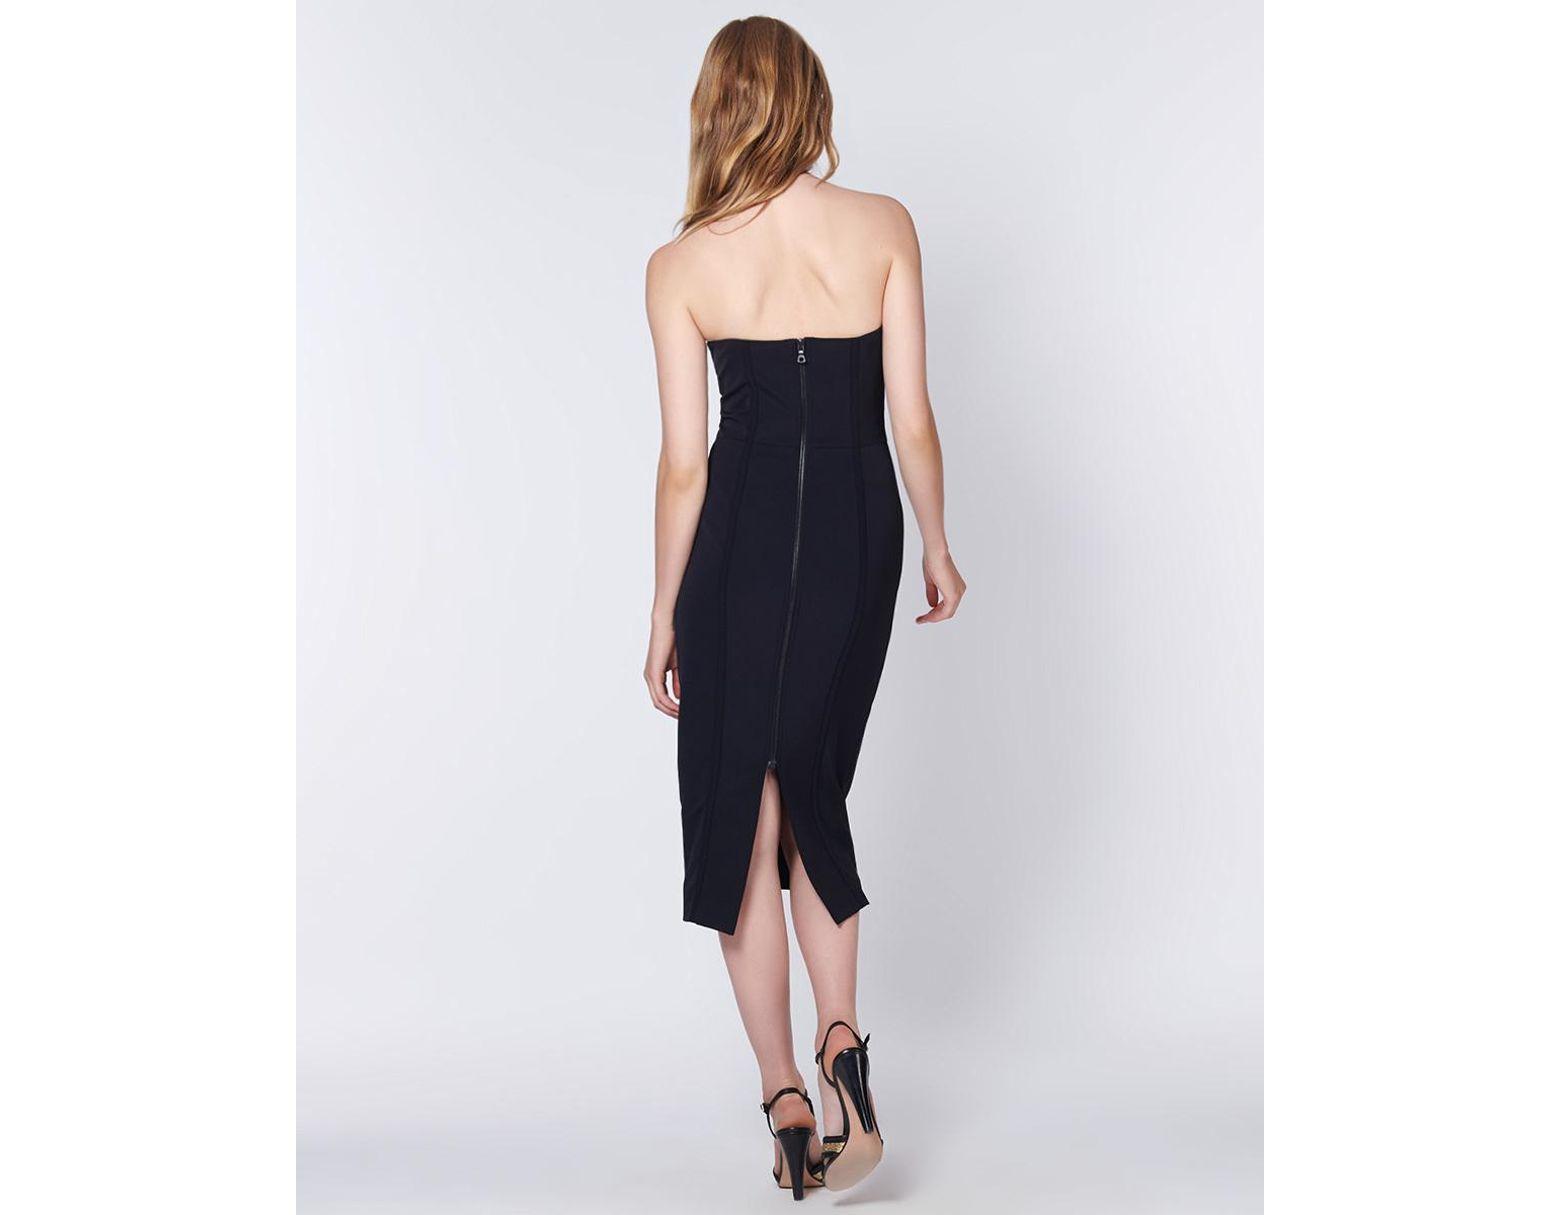 104c04d13d3 Lyst - Veronica Beard Maui Dress in Black